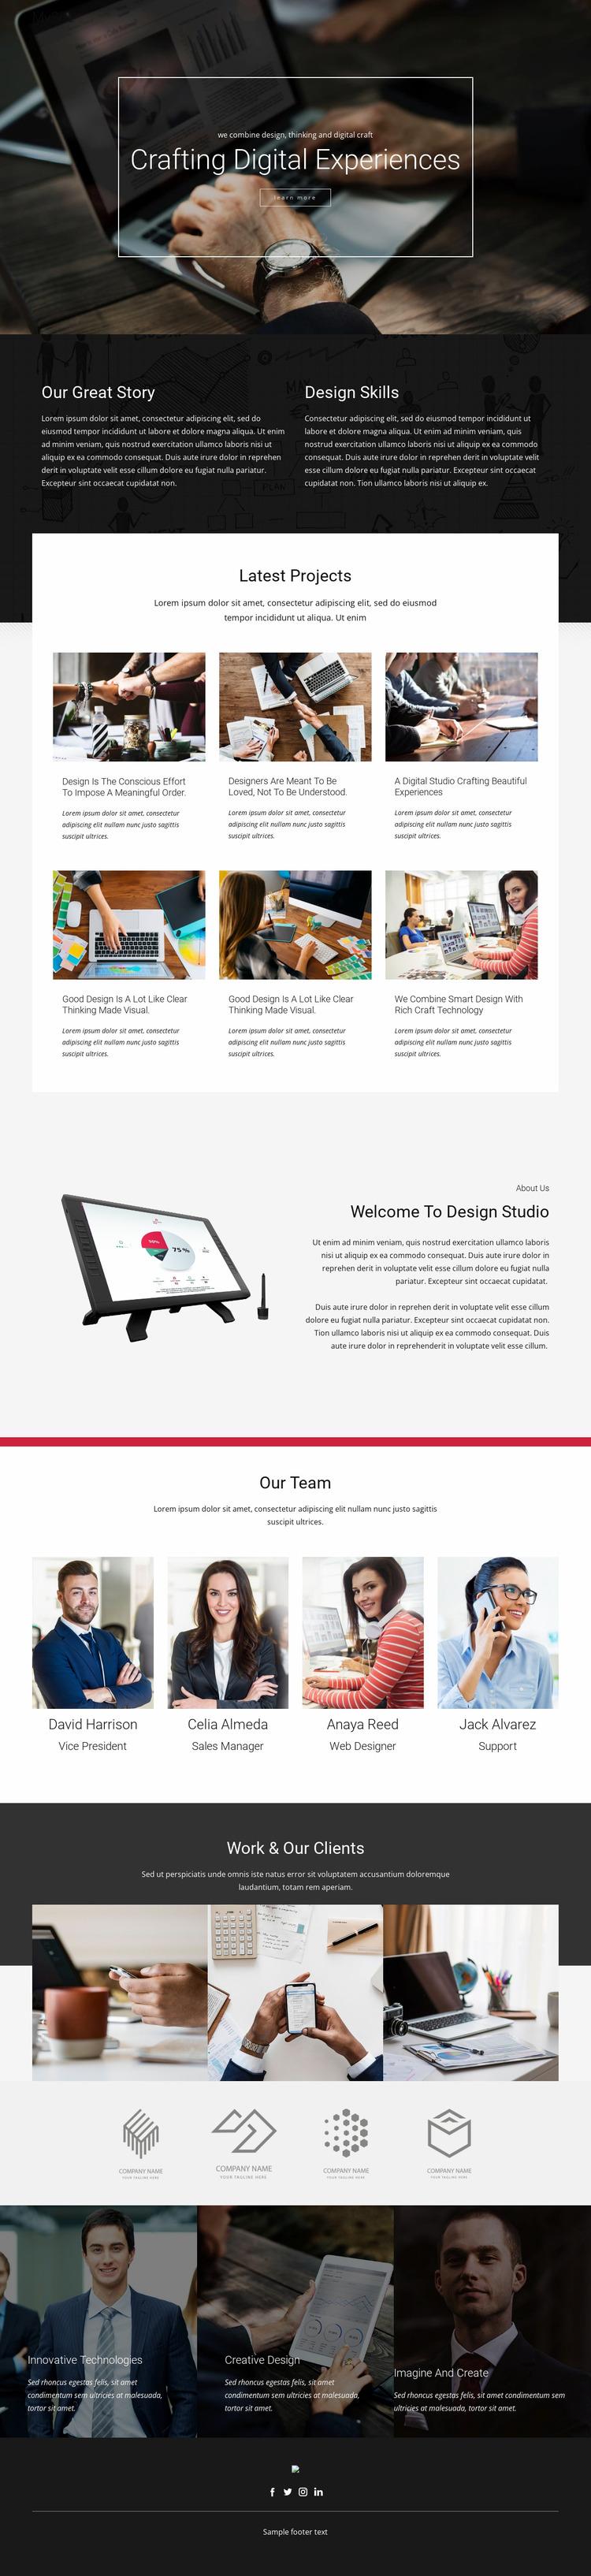 Crafting Digital Design Studio Website Mockup